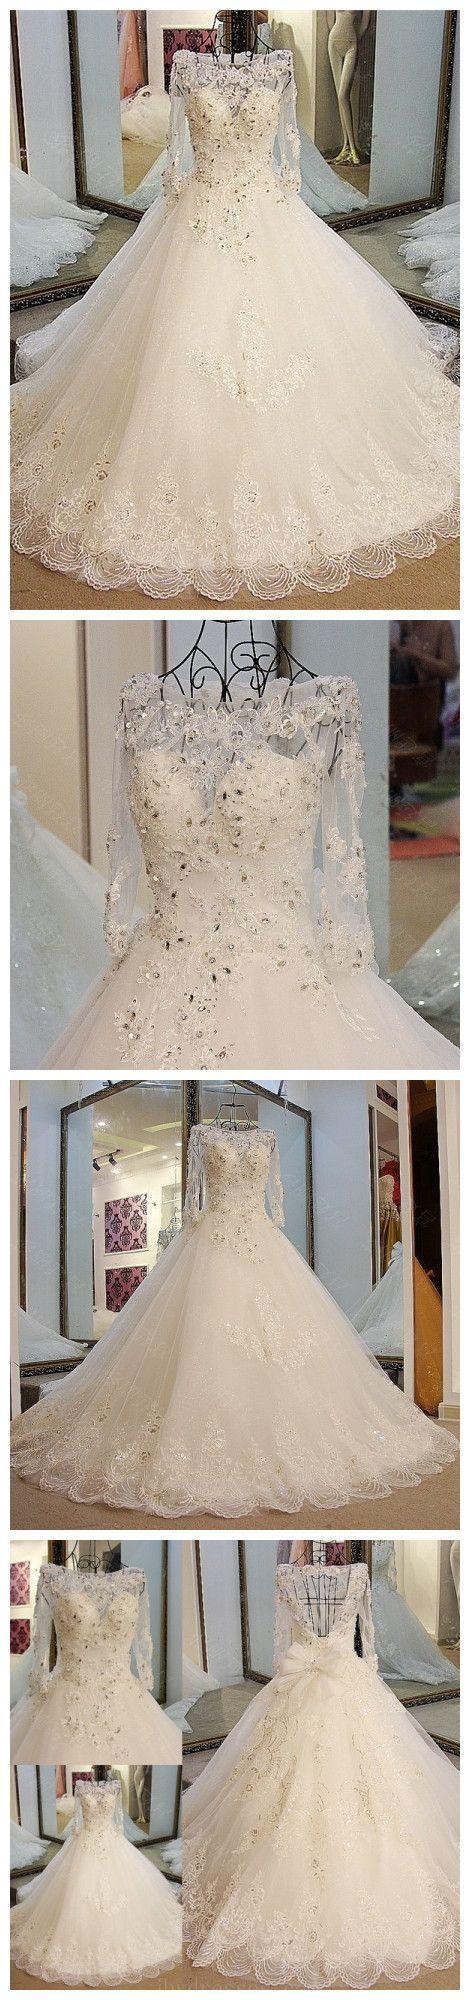 Best wedding dresses of 2018   best Wedding Dresses  images on Pinterest